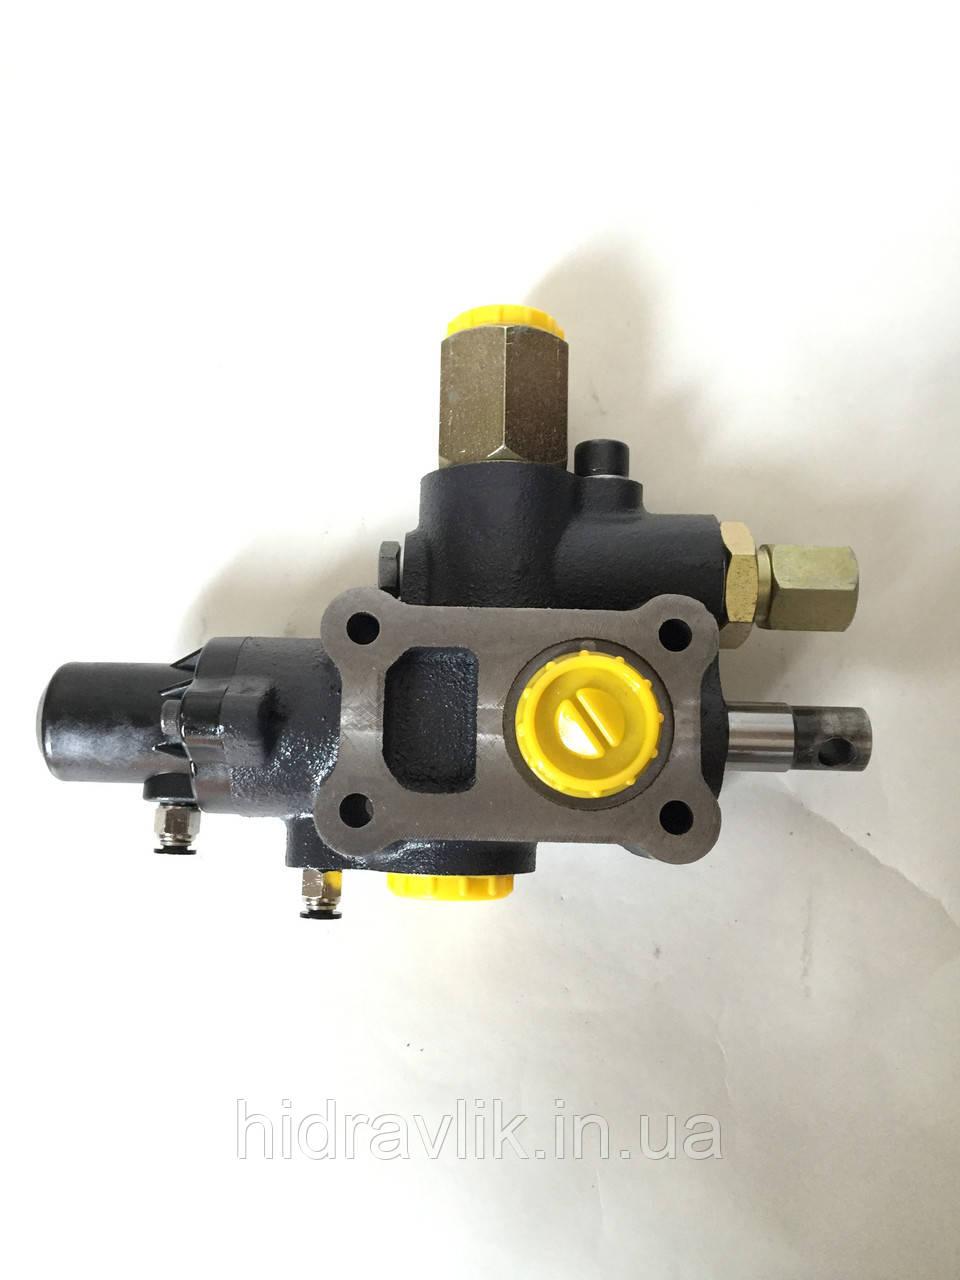 Комплект гидравлики на тягач IVECO